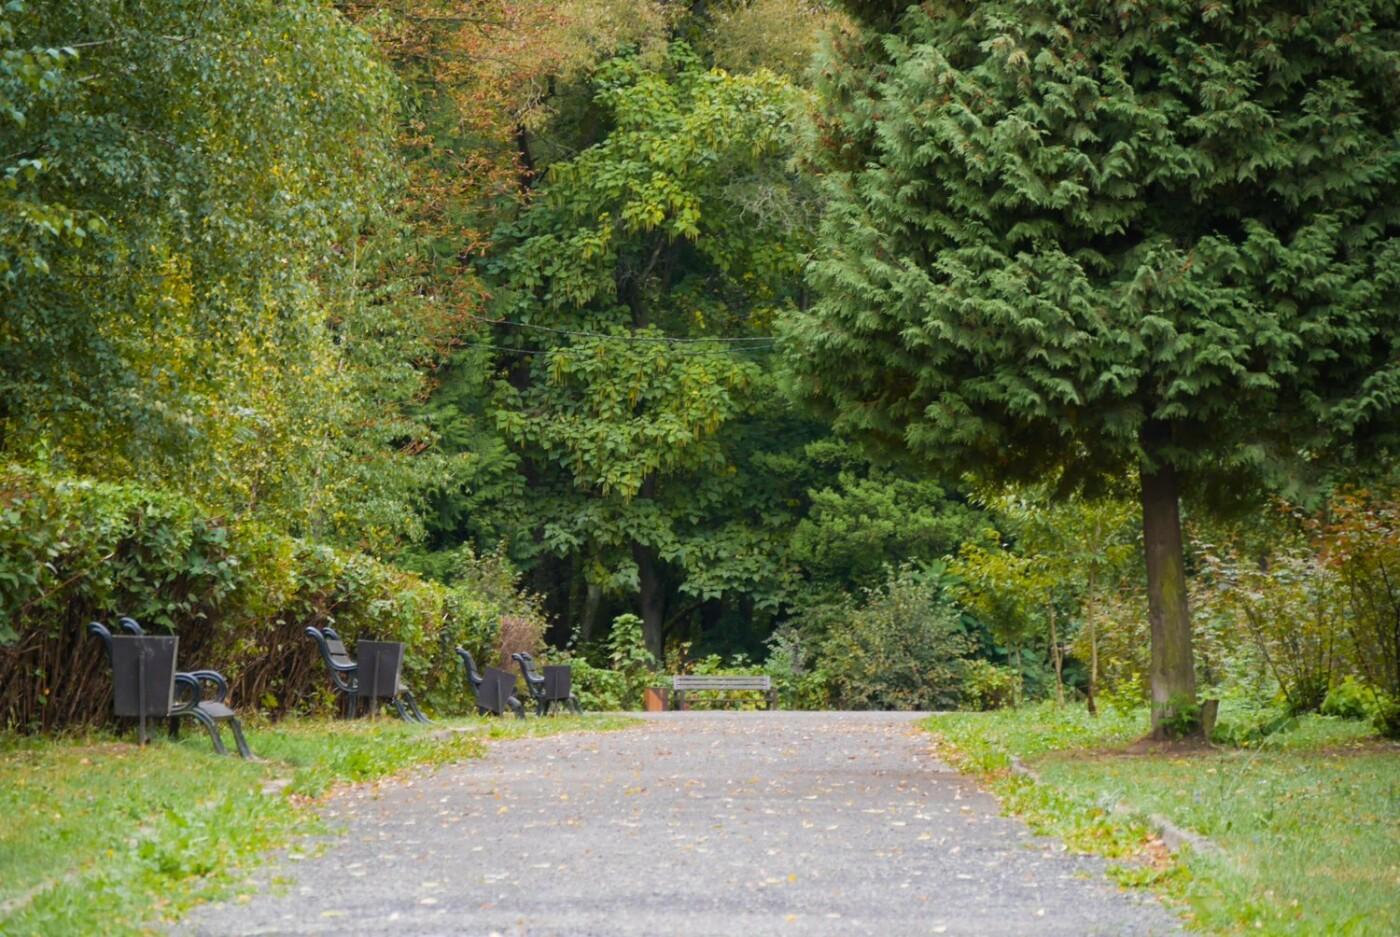 Ще одну алею у Боздоському парку Ужгорода привели до ладу (ФОТО), фото-1